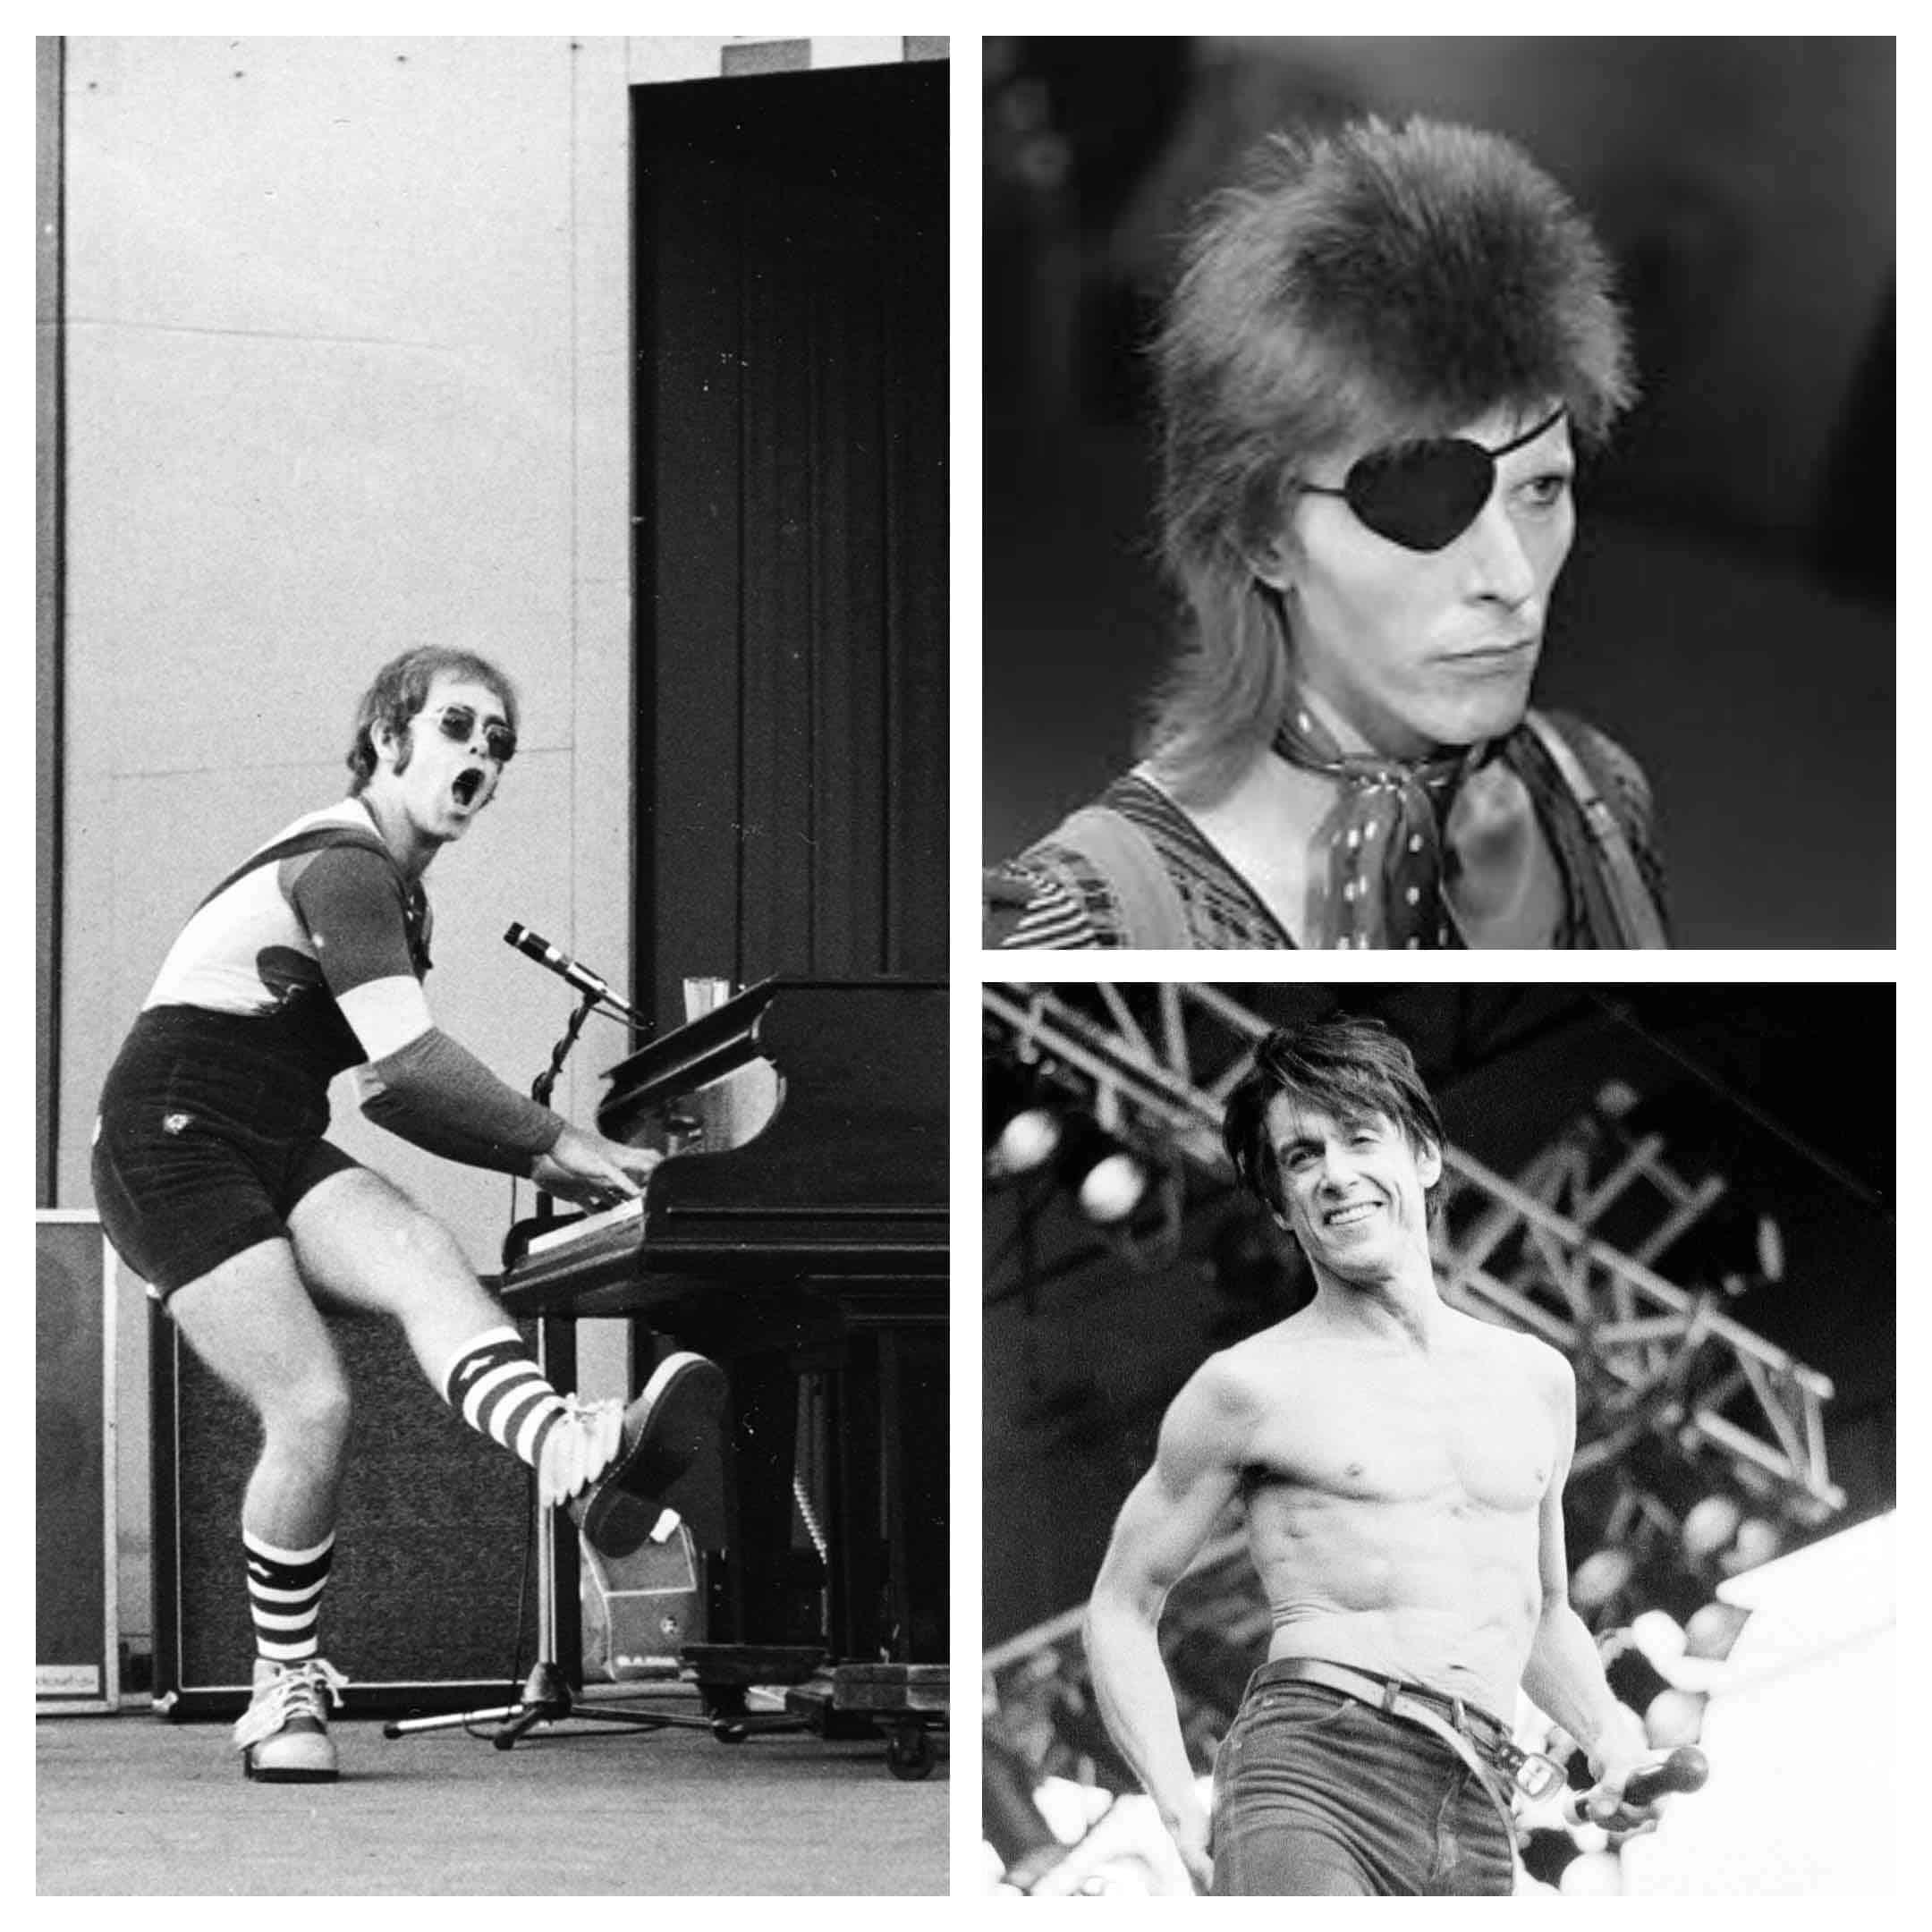 Elton John, David Bowie, Iggy Pop